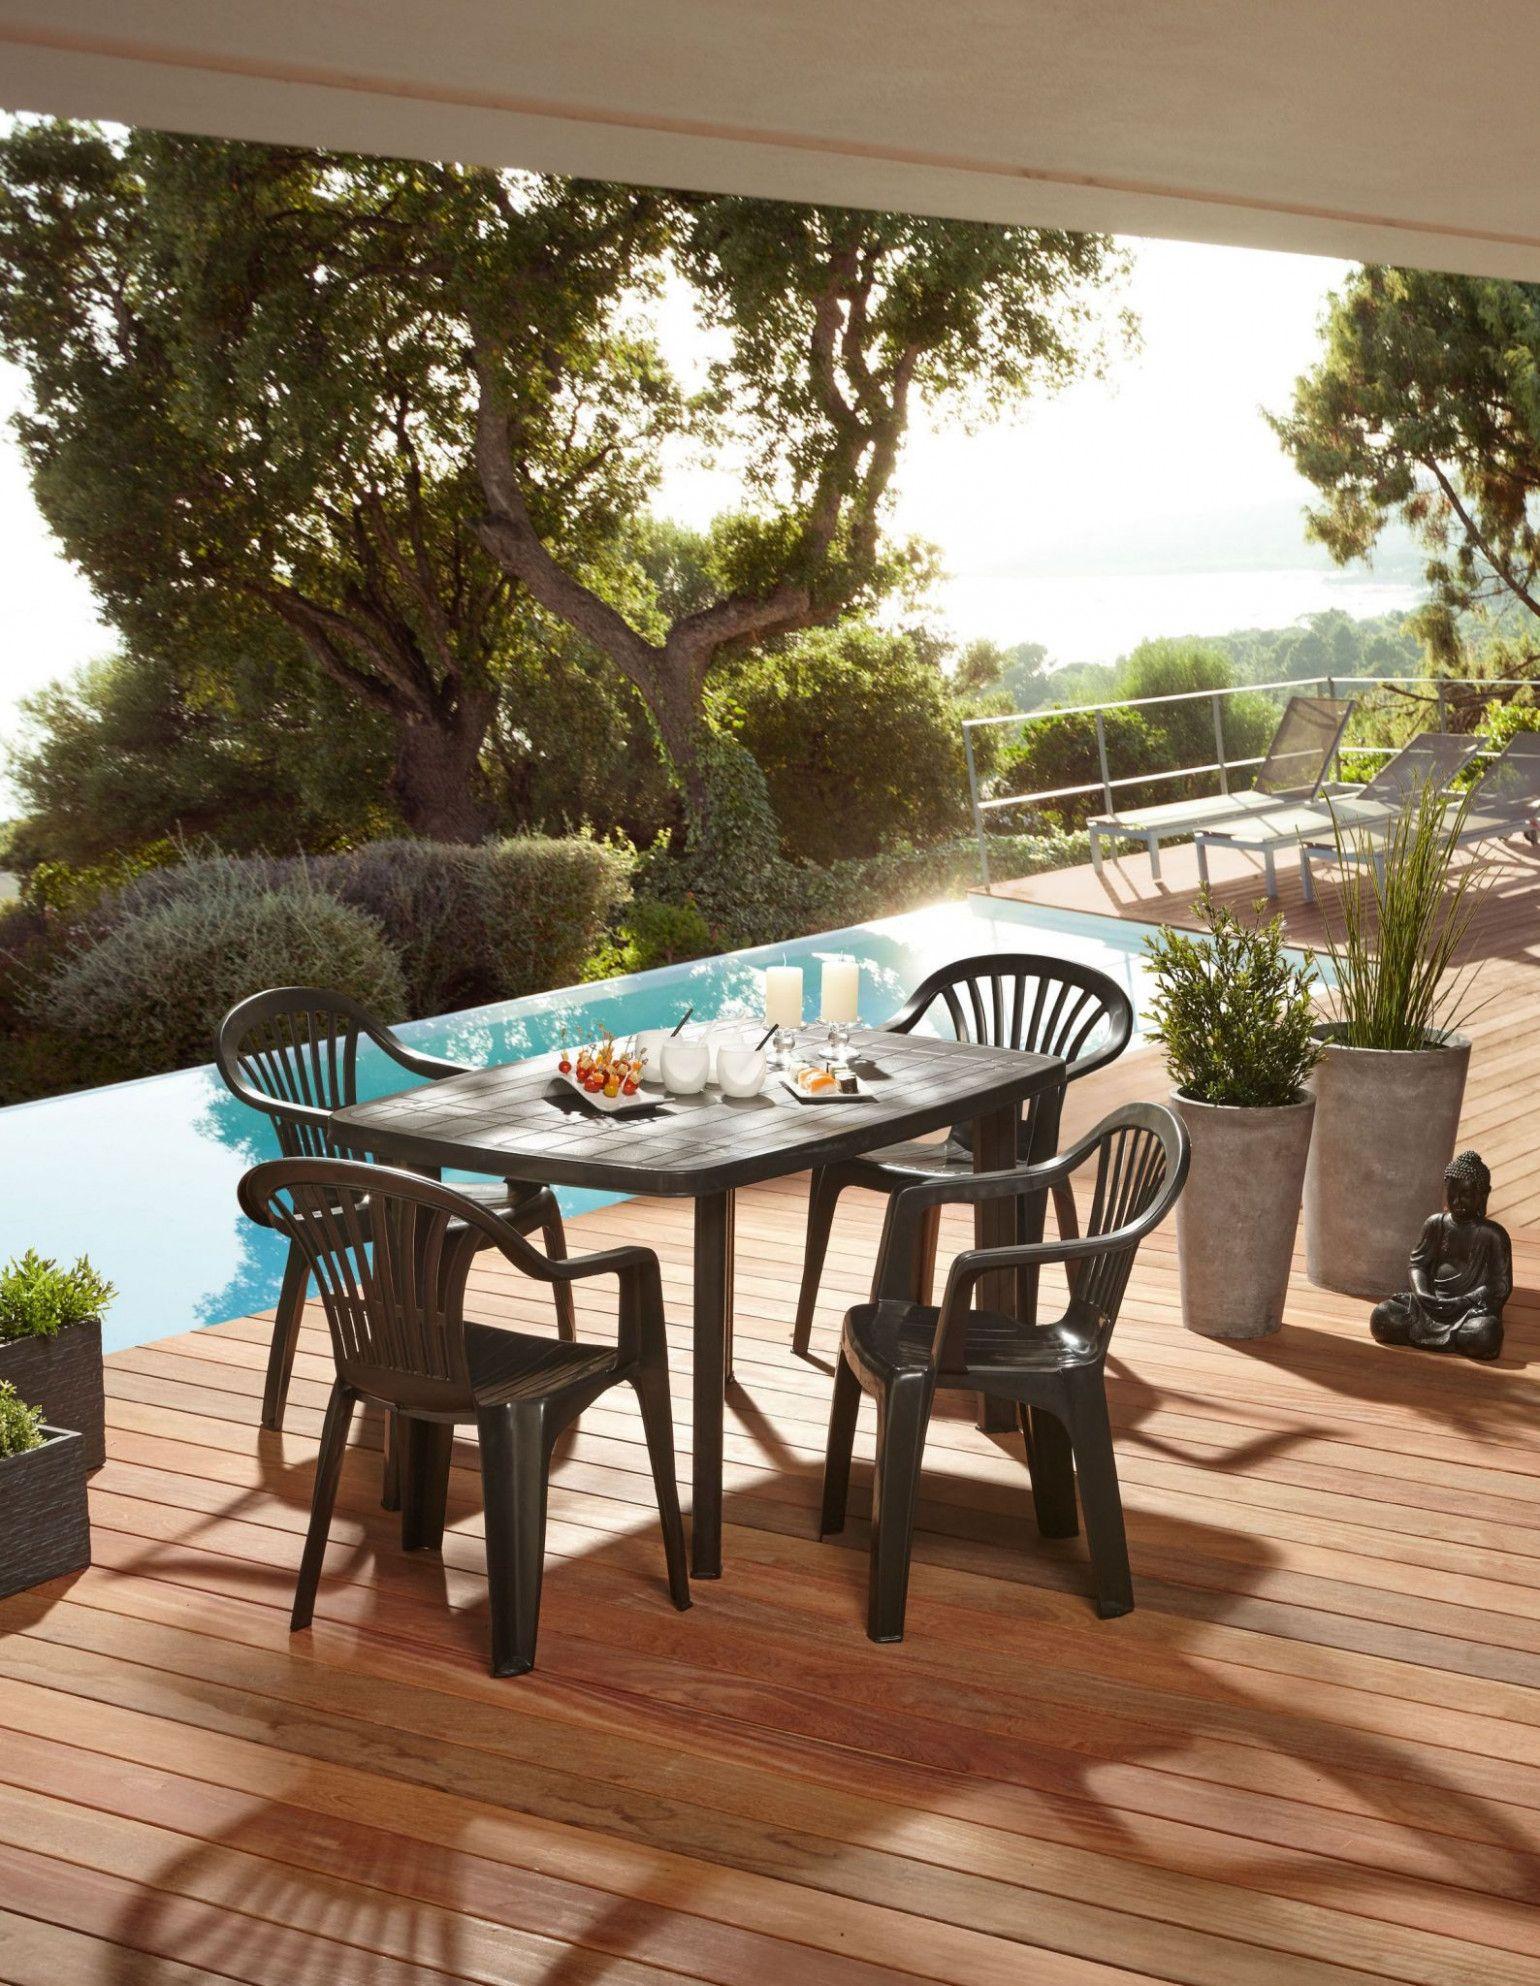 Table De Jardin Hesperide Piazza | Patio, Outdoor Decor, Jardin à Fauteuil Hesperide Piazza Centrakor